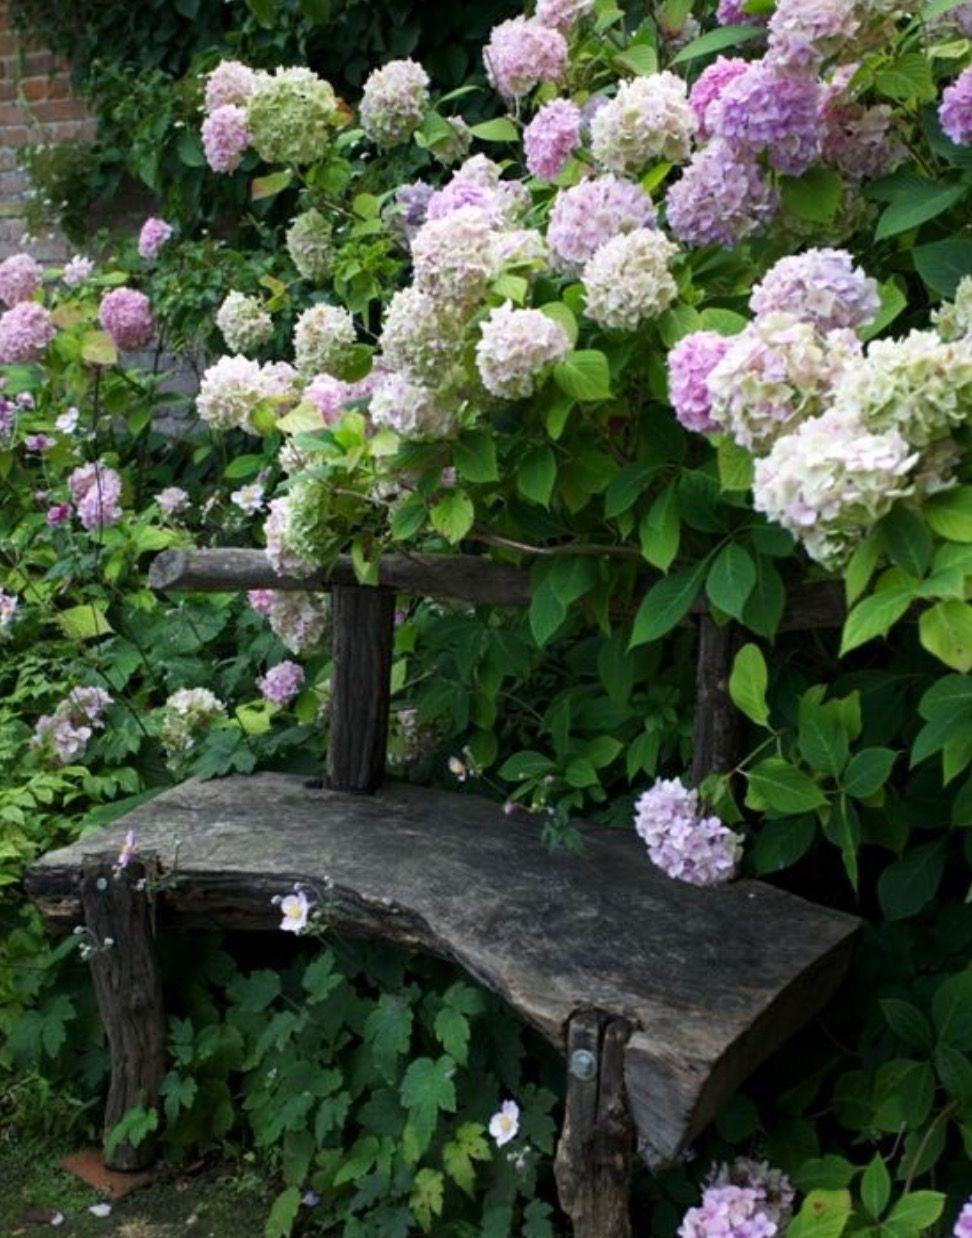 Pin by janet gorman on garden pinterest hydrangea gardens and